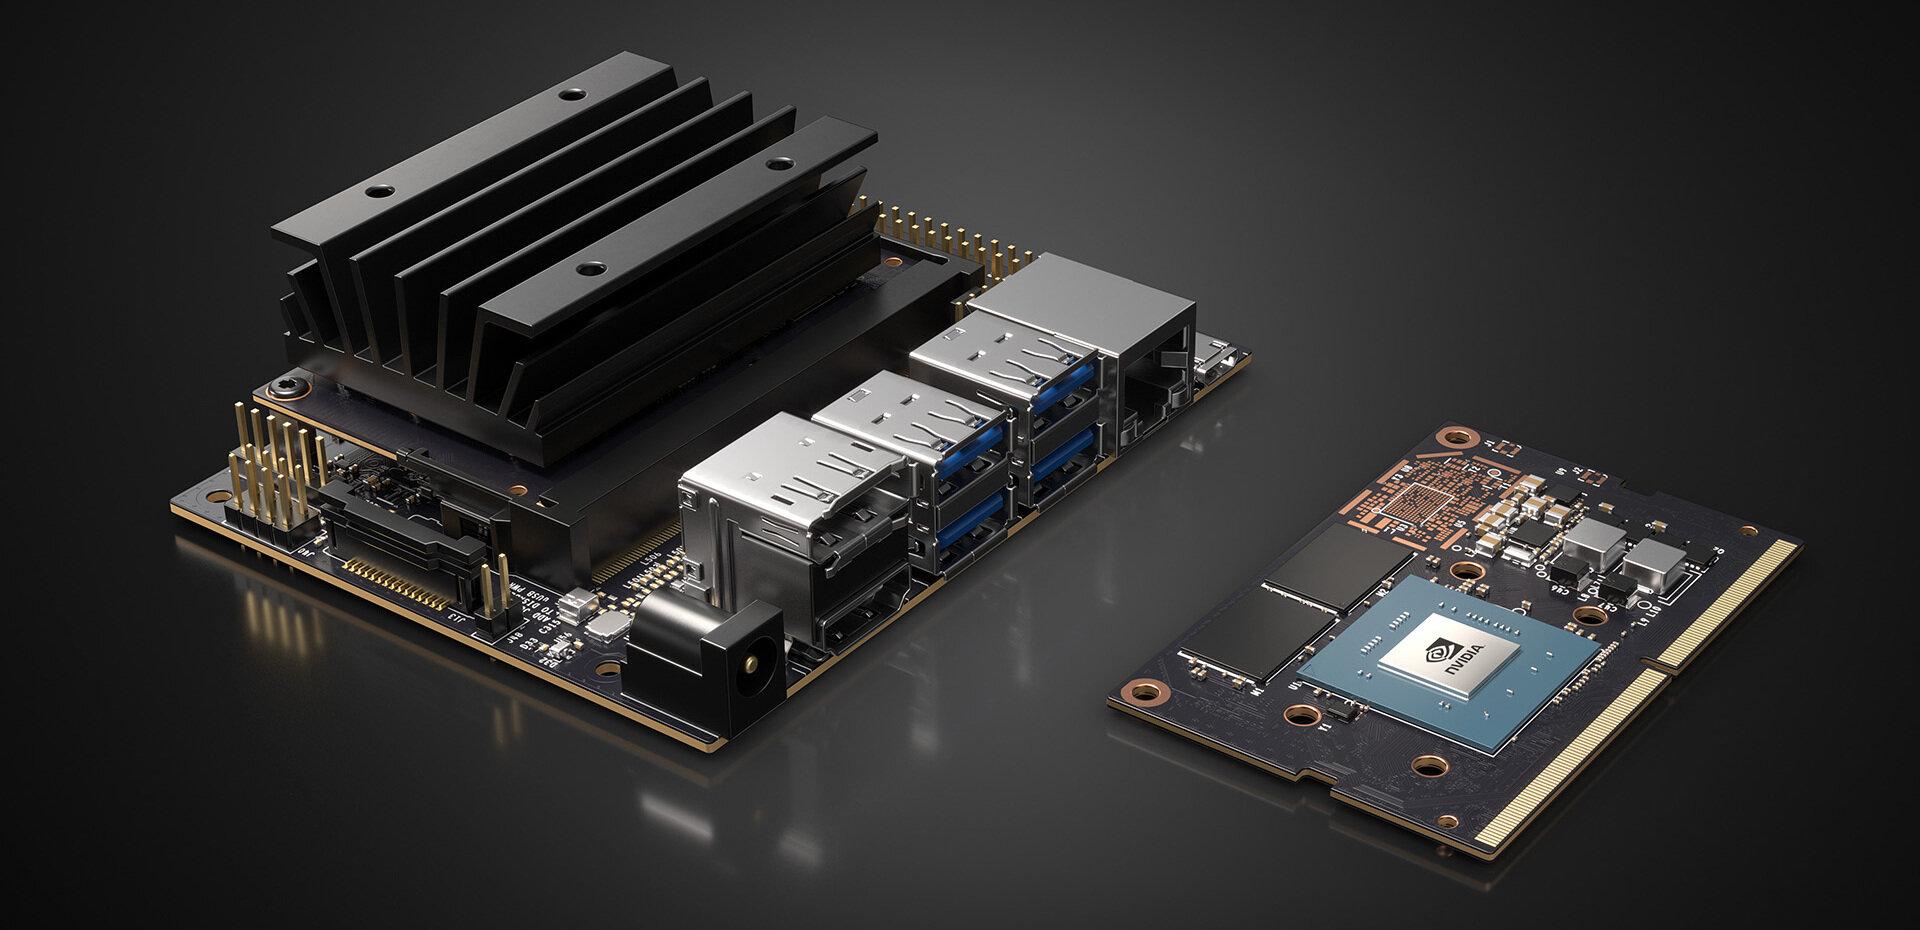 NVIDIA Jetson Nano : un super Raspberry Pi à 128 CUDA Cores pour 99 dollars